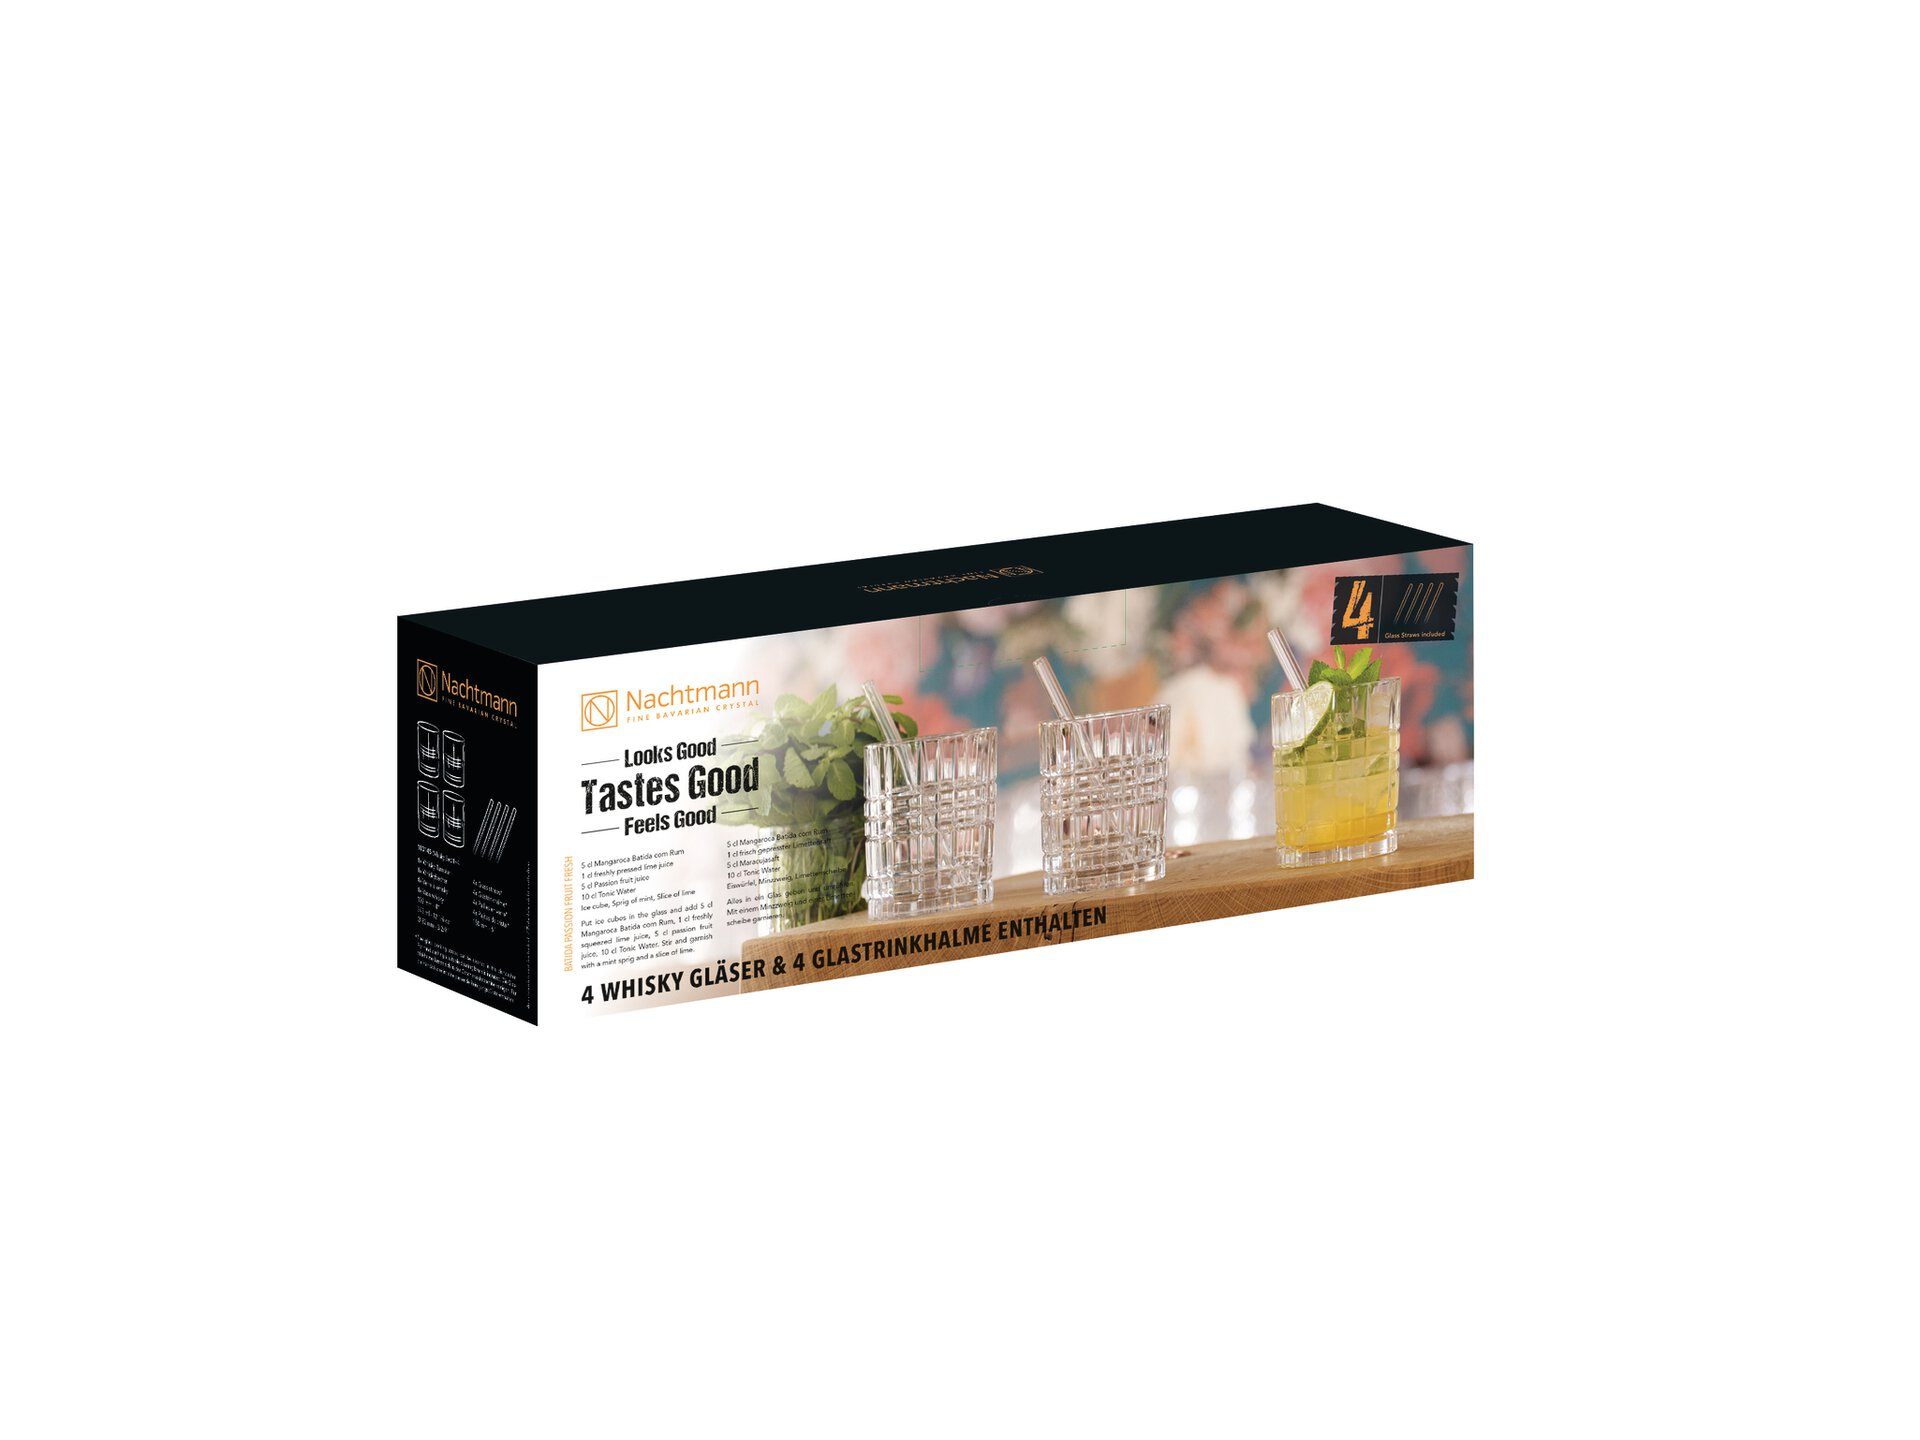 Aperitifglas Tastes Good Nachtmann Glas 8 x 10 x 8 cm